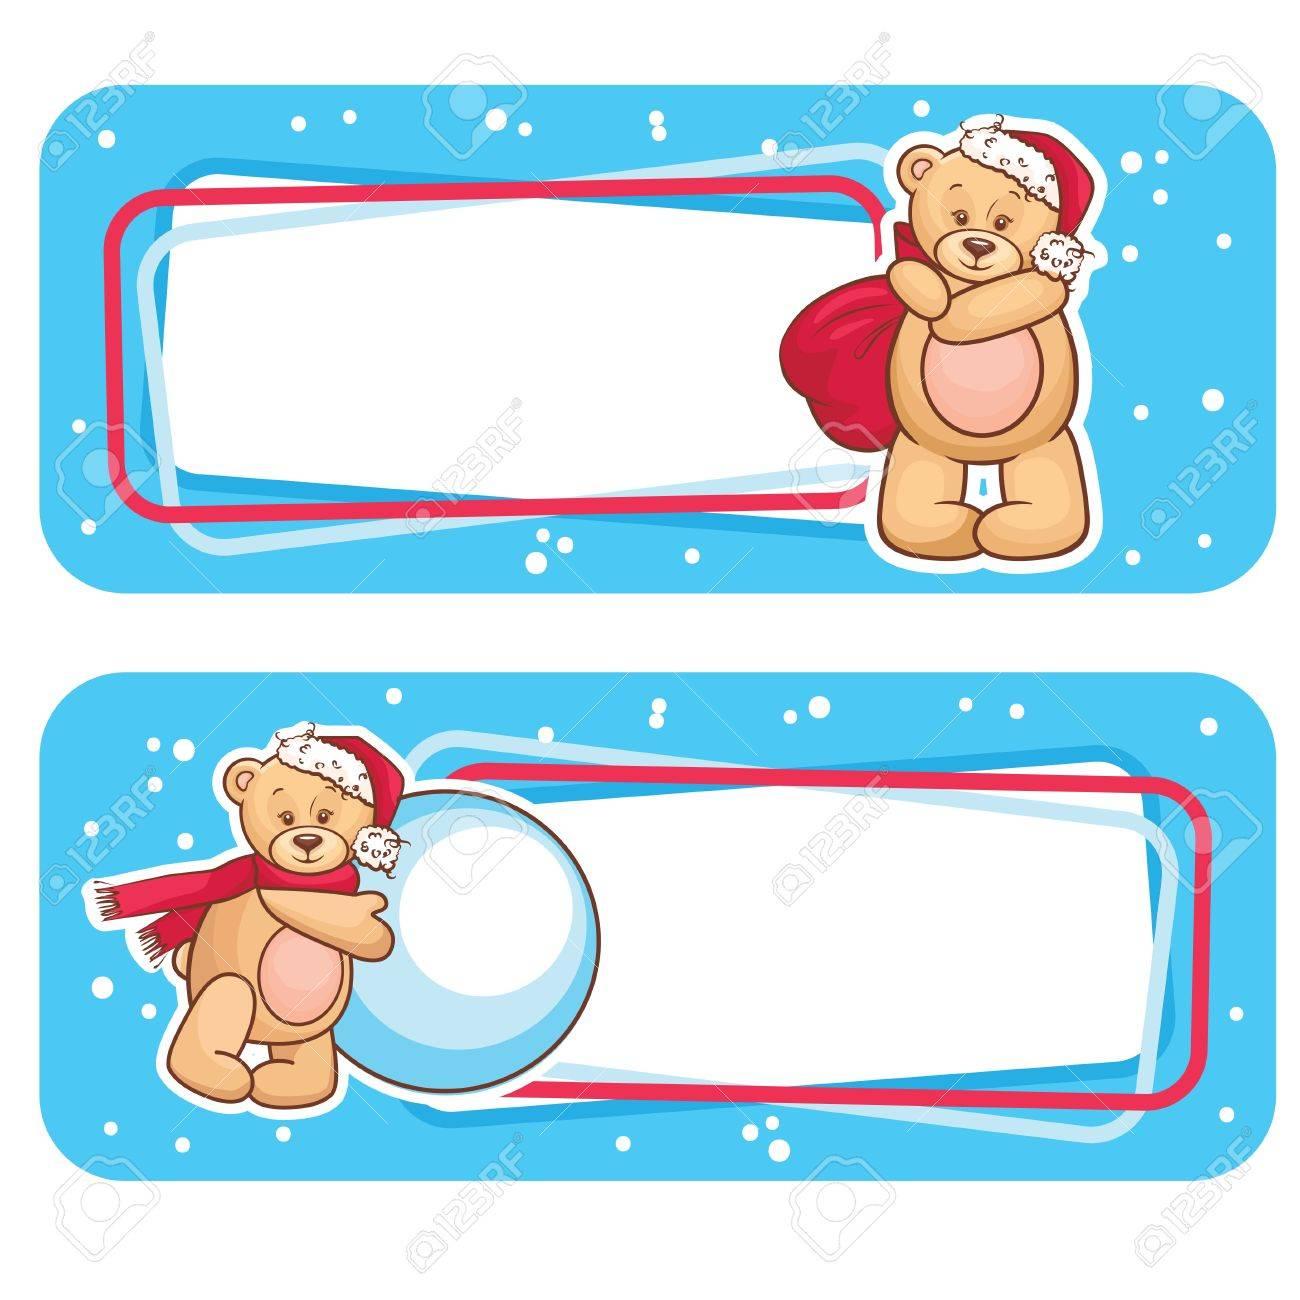 Christmas Season Banner, Winter Labels with Teddy Bear Stock Vector - 16750662